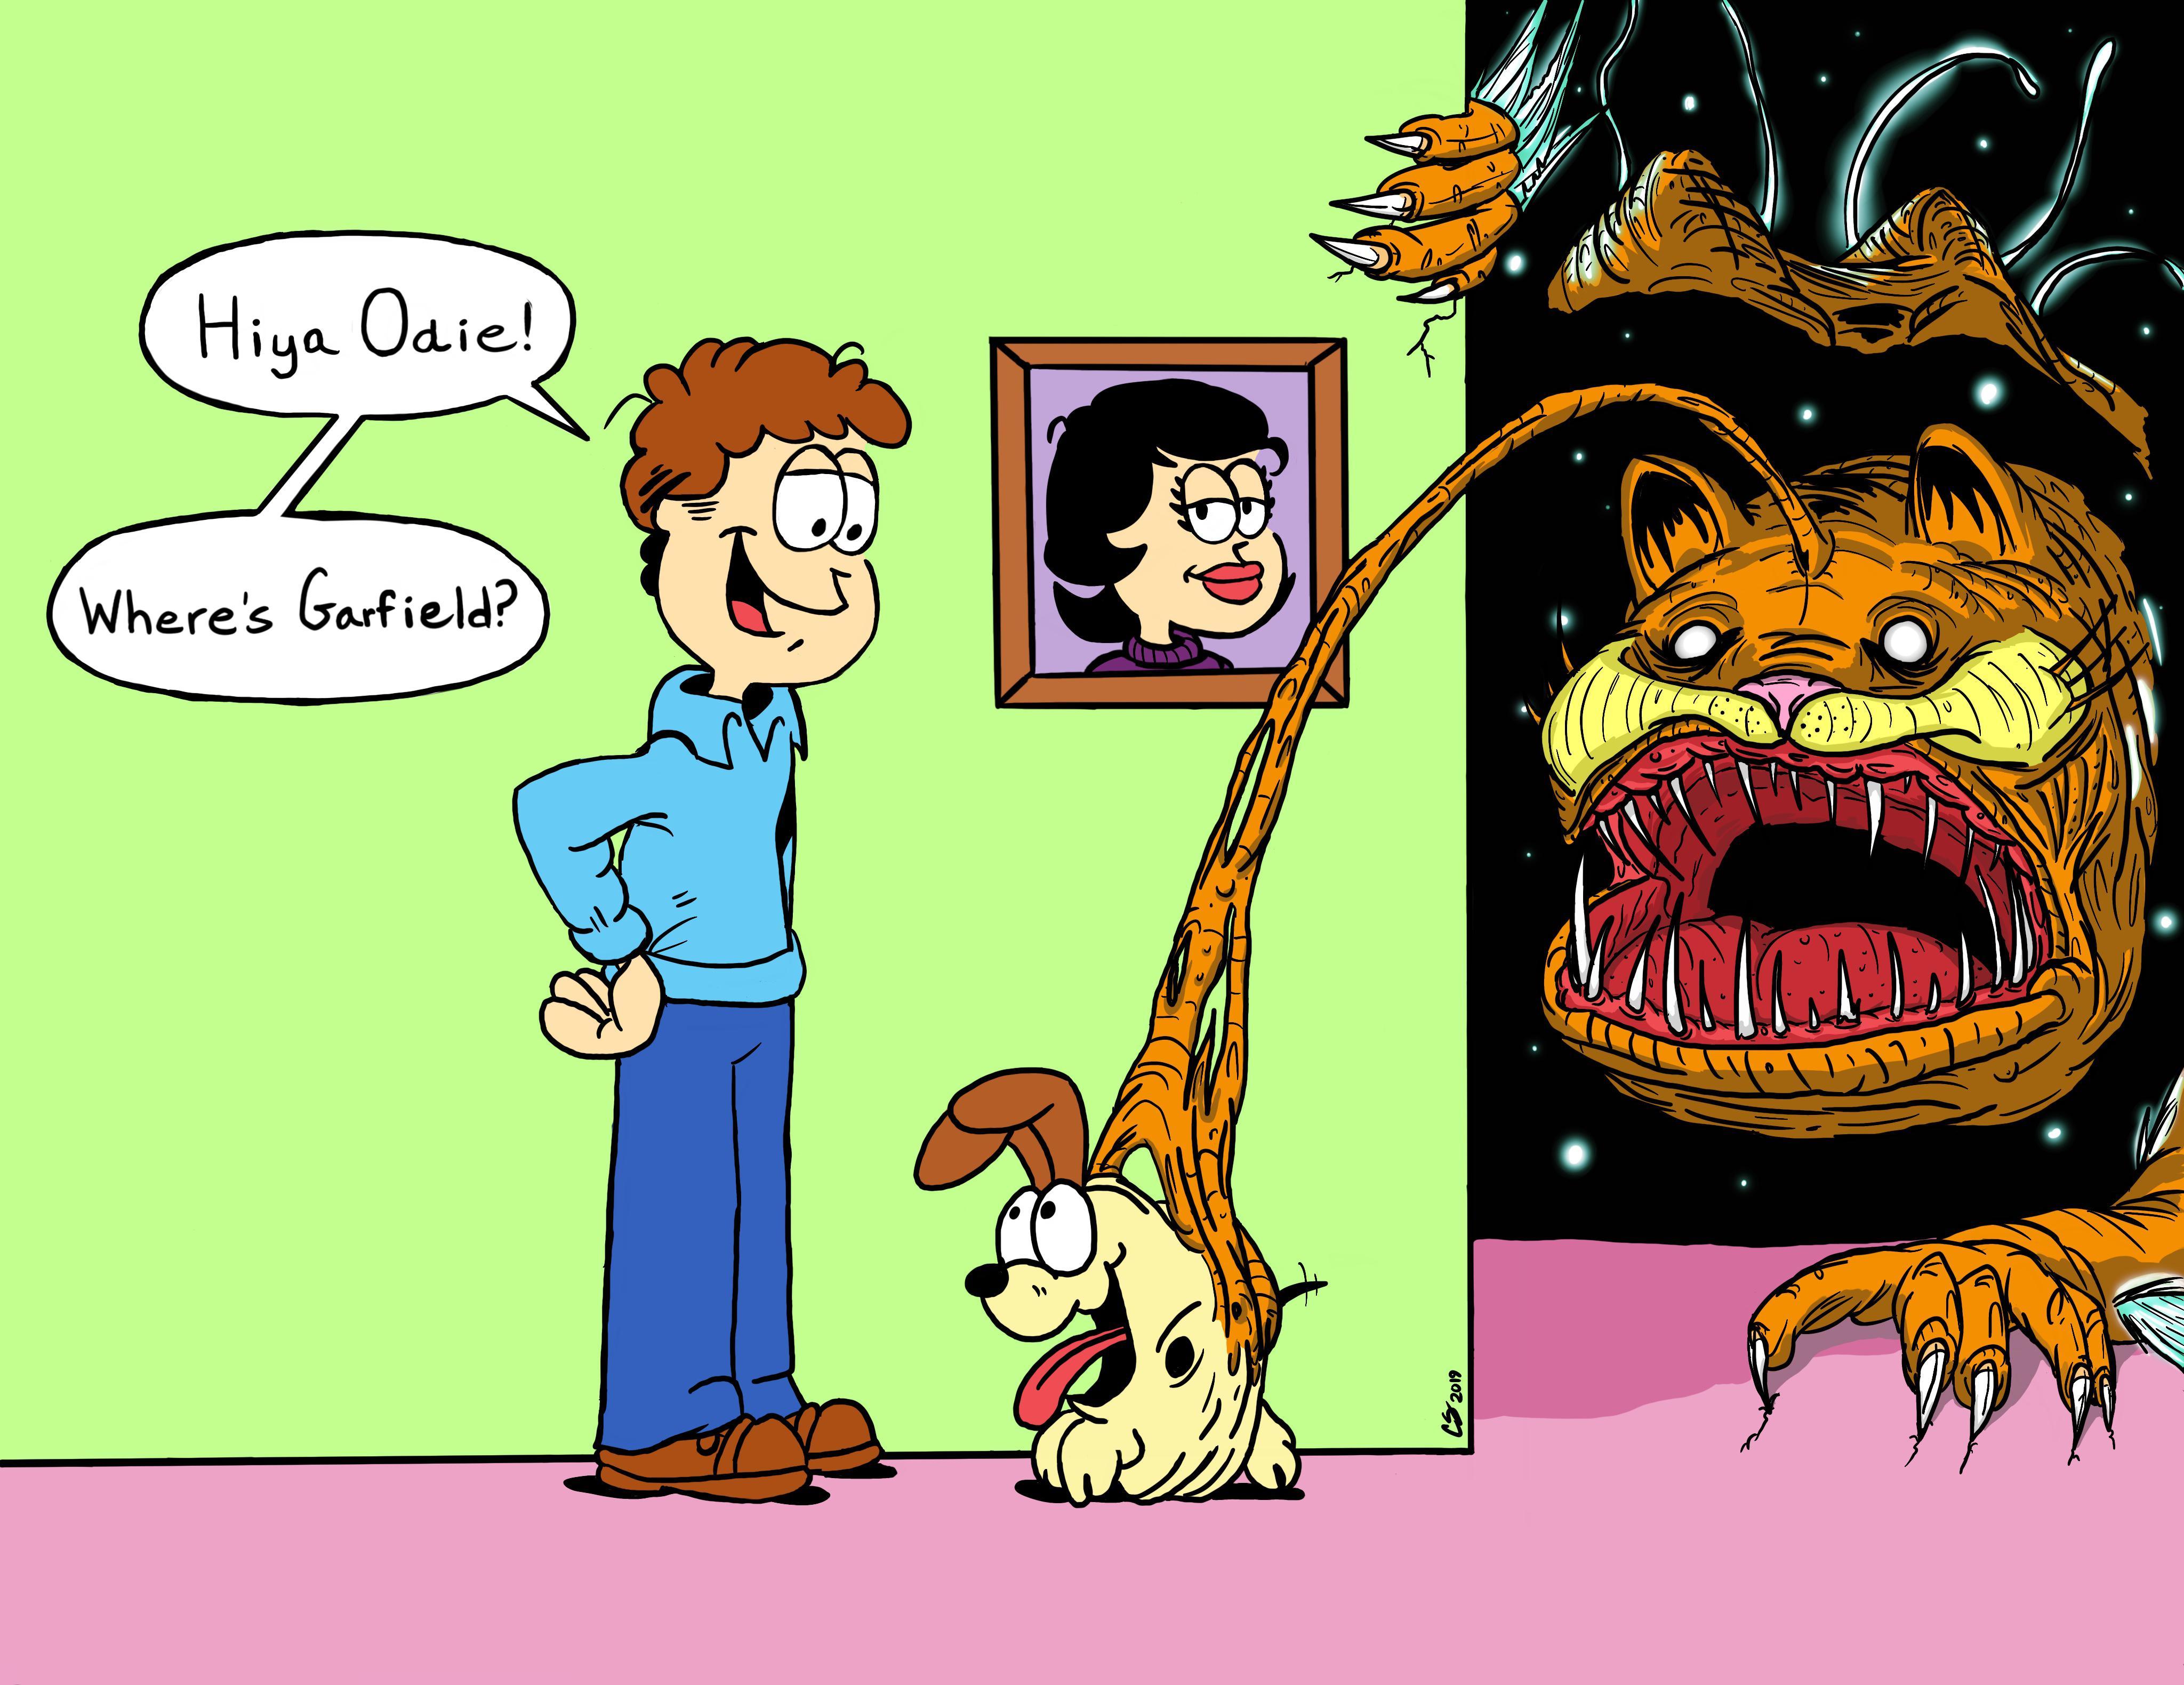 You Re Not Very Perceptive Jon Recreation R Imsorryjon Creepy Garfield Know Your Meme